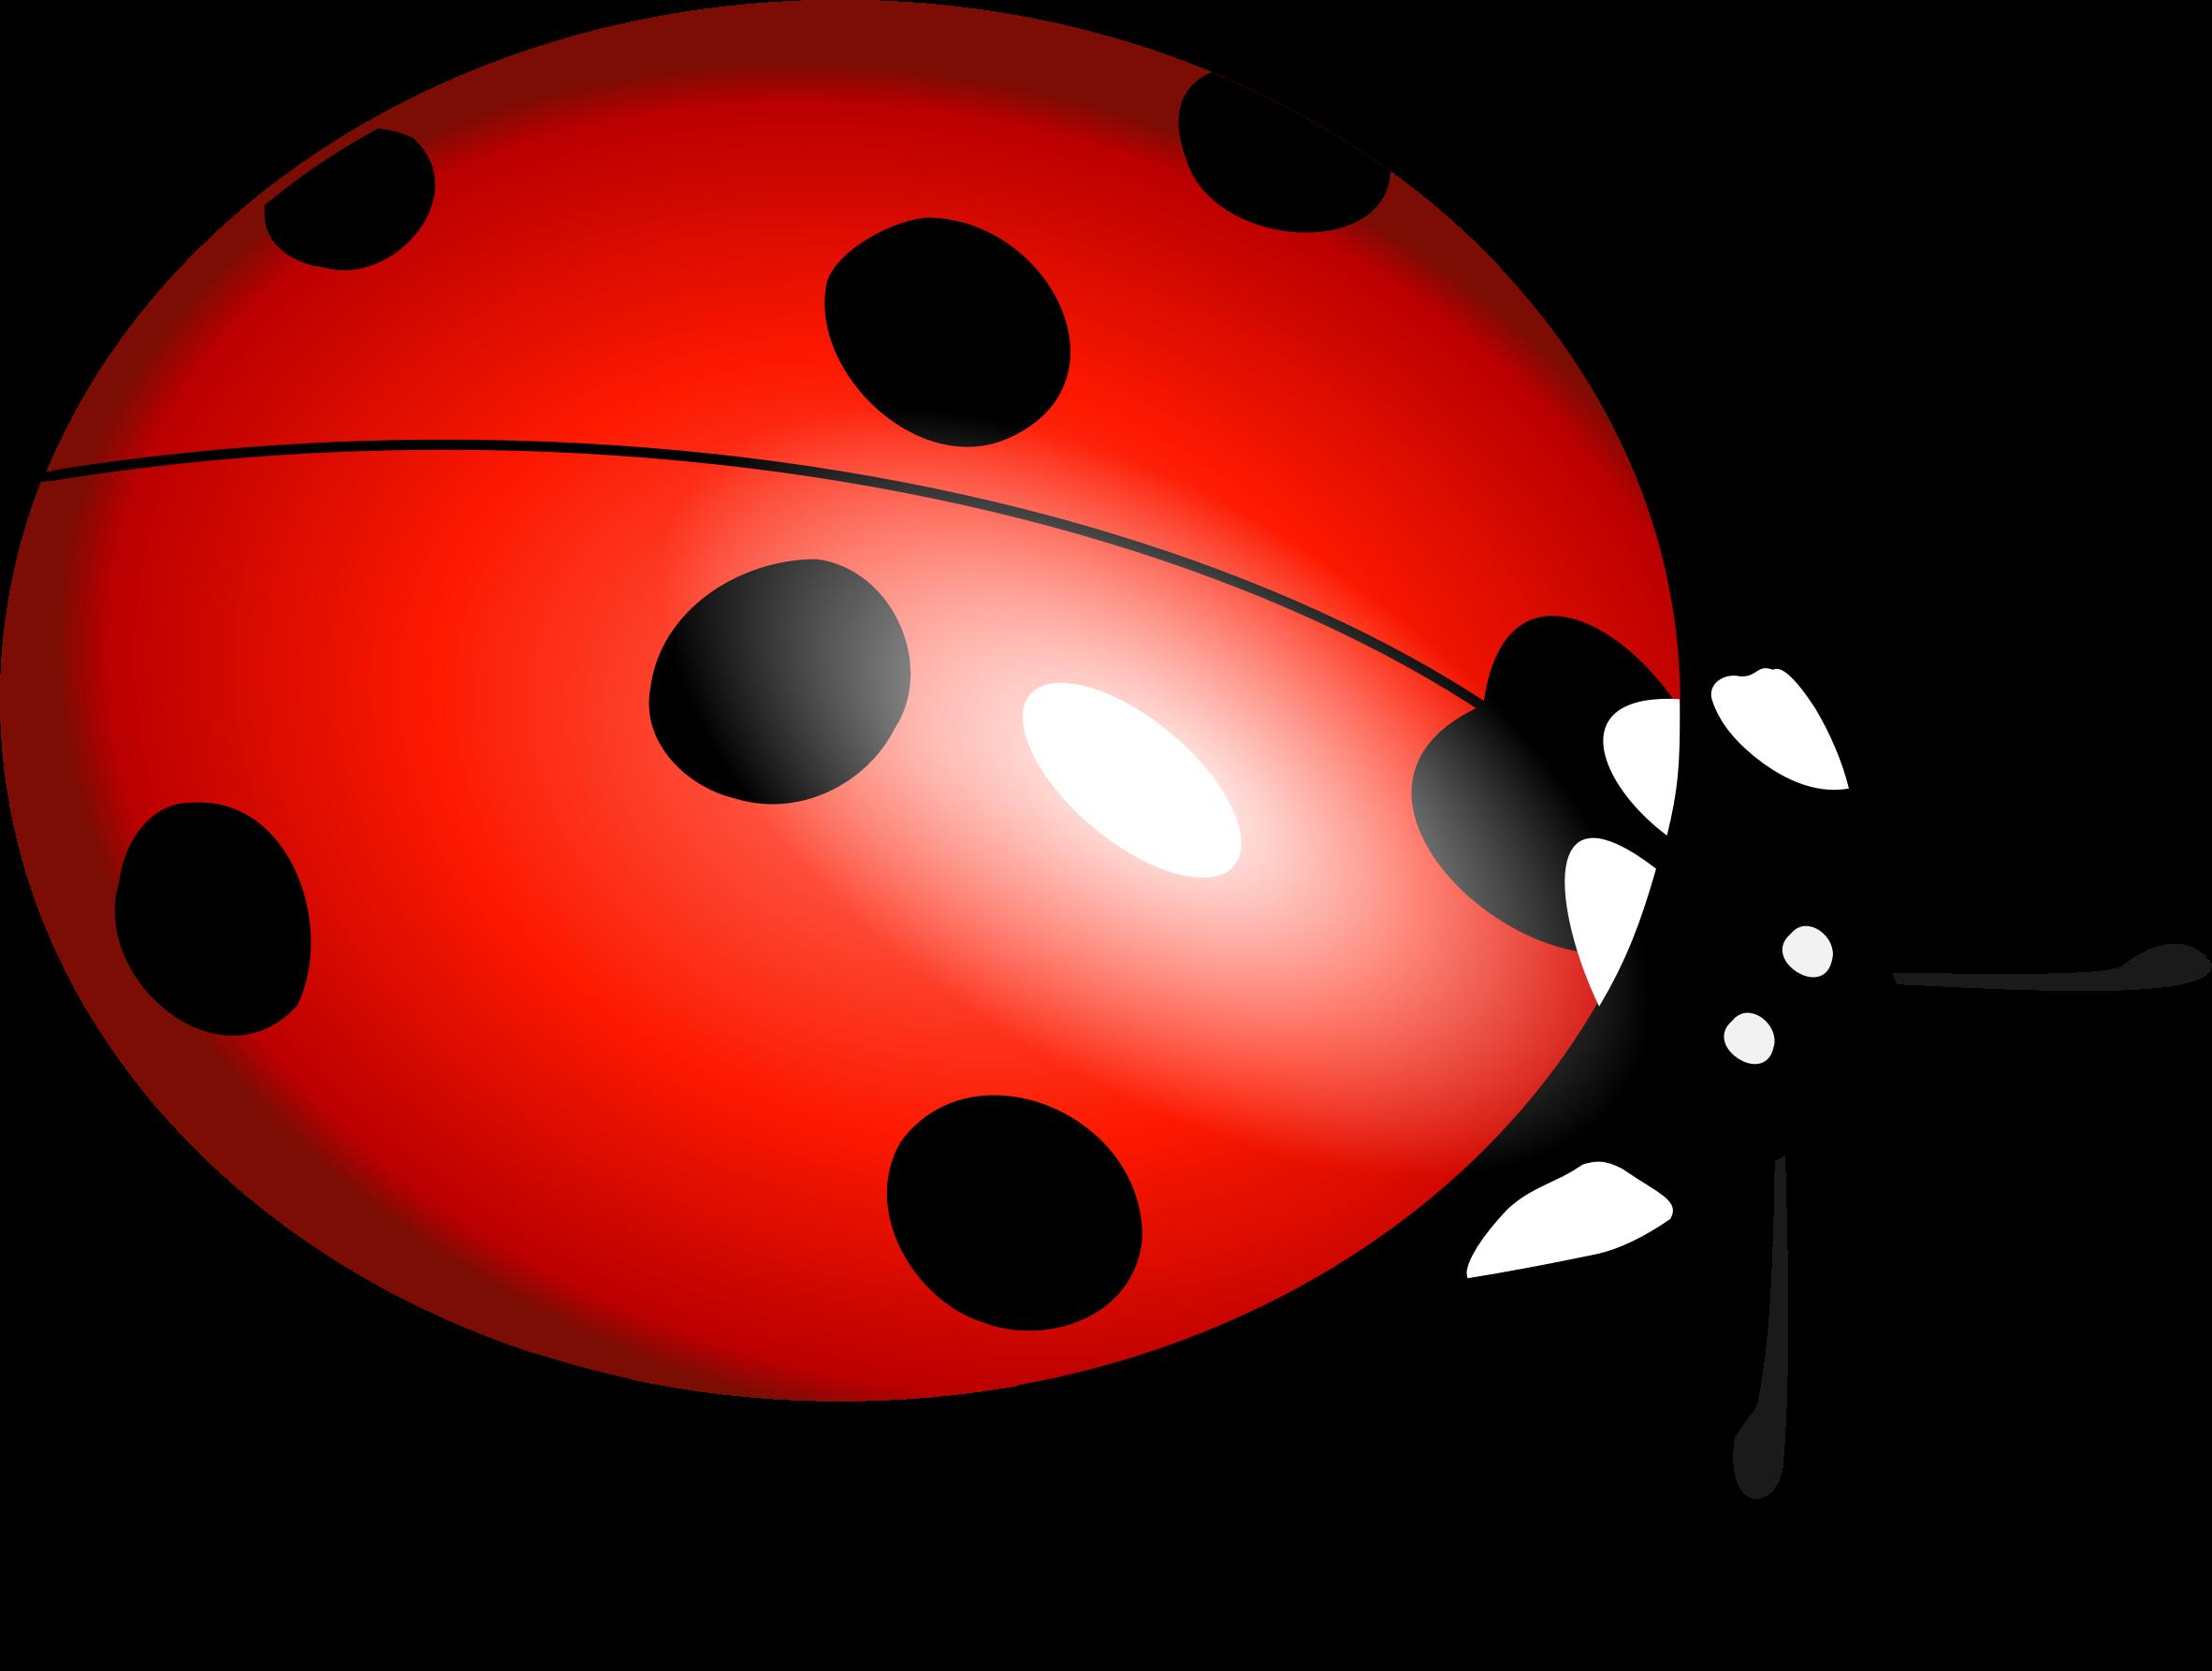 Ladybirds boru big image. Ladybug clipart small